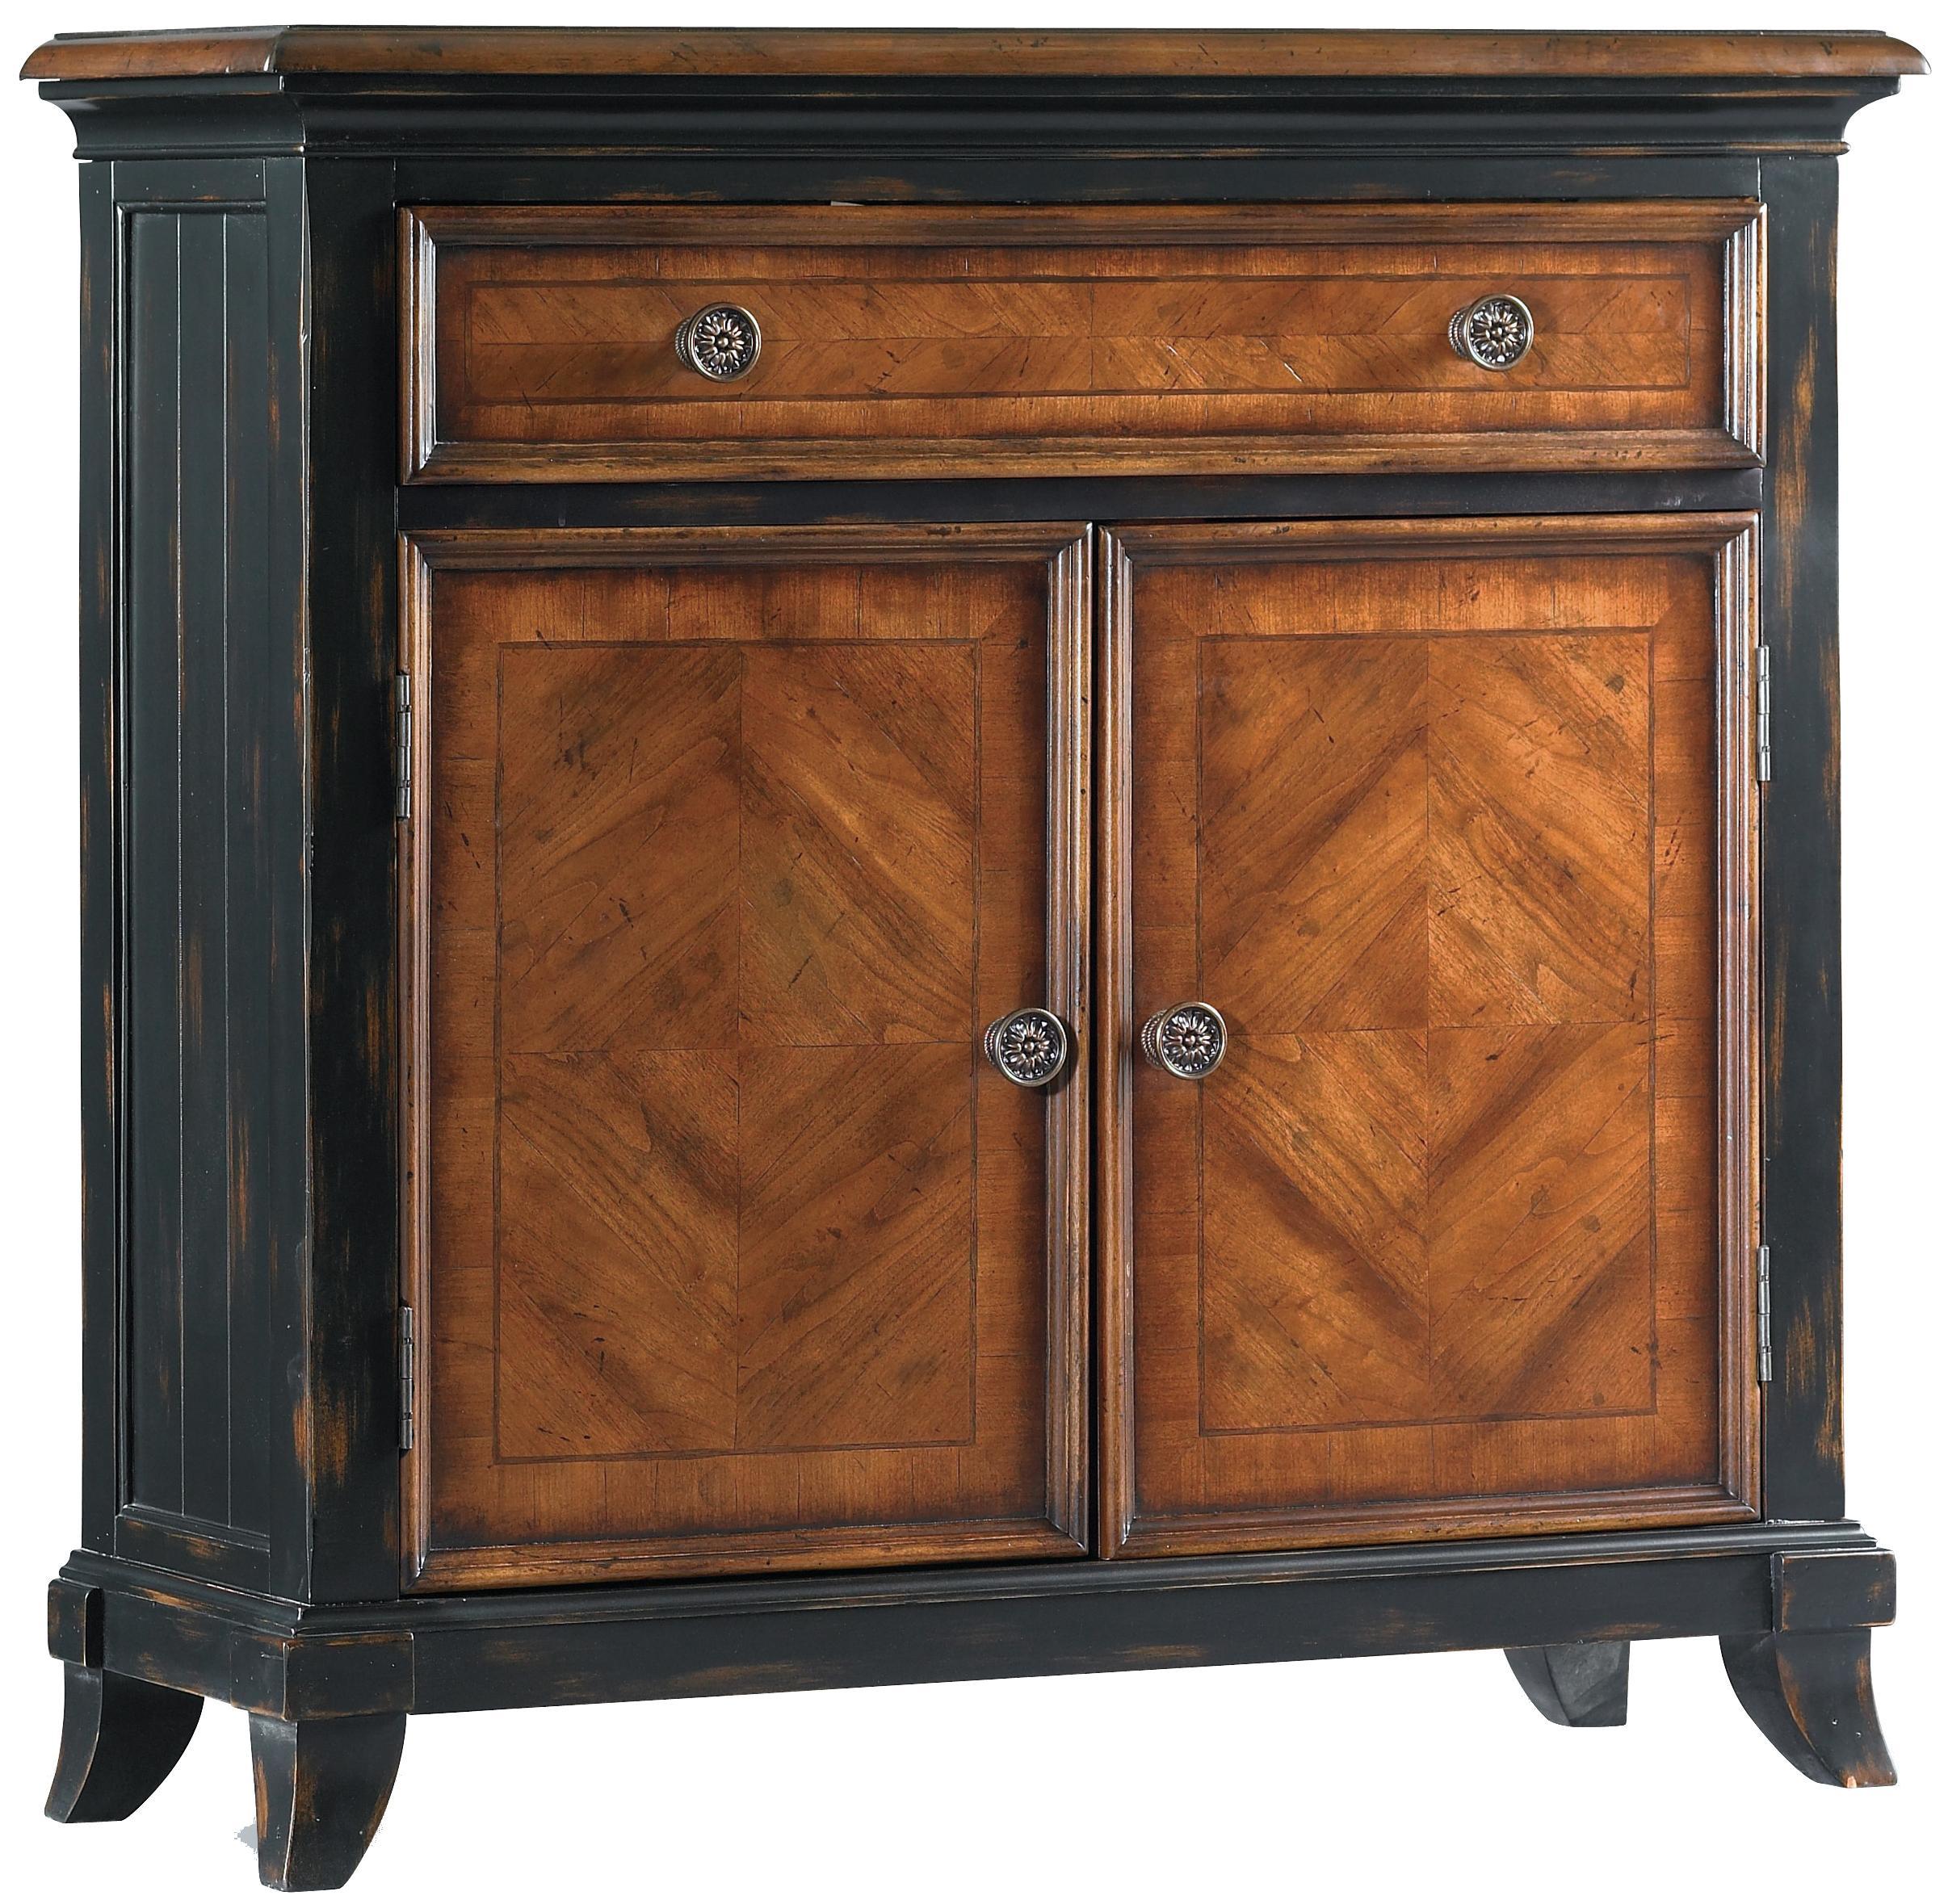 Hooker Furniture Wingate Chest - Item Number: 593-50-003